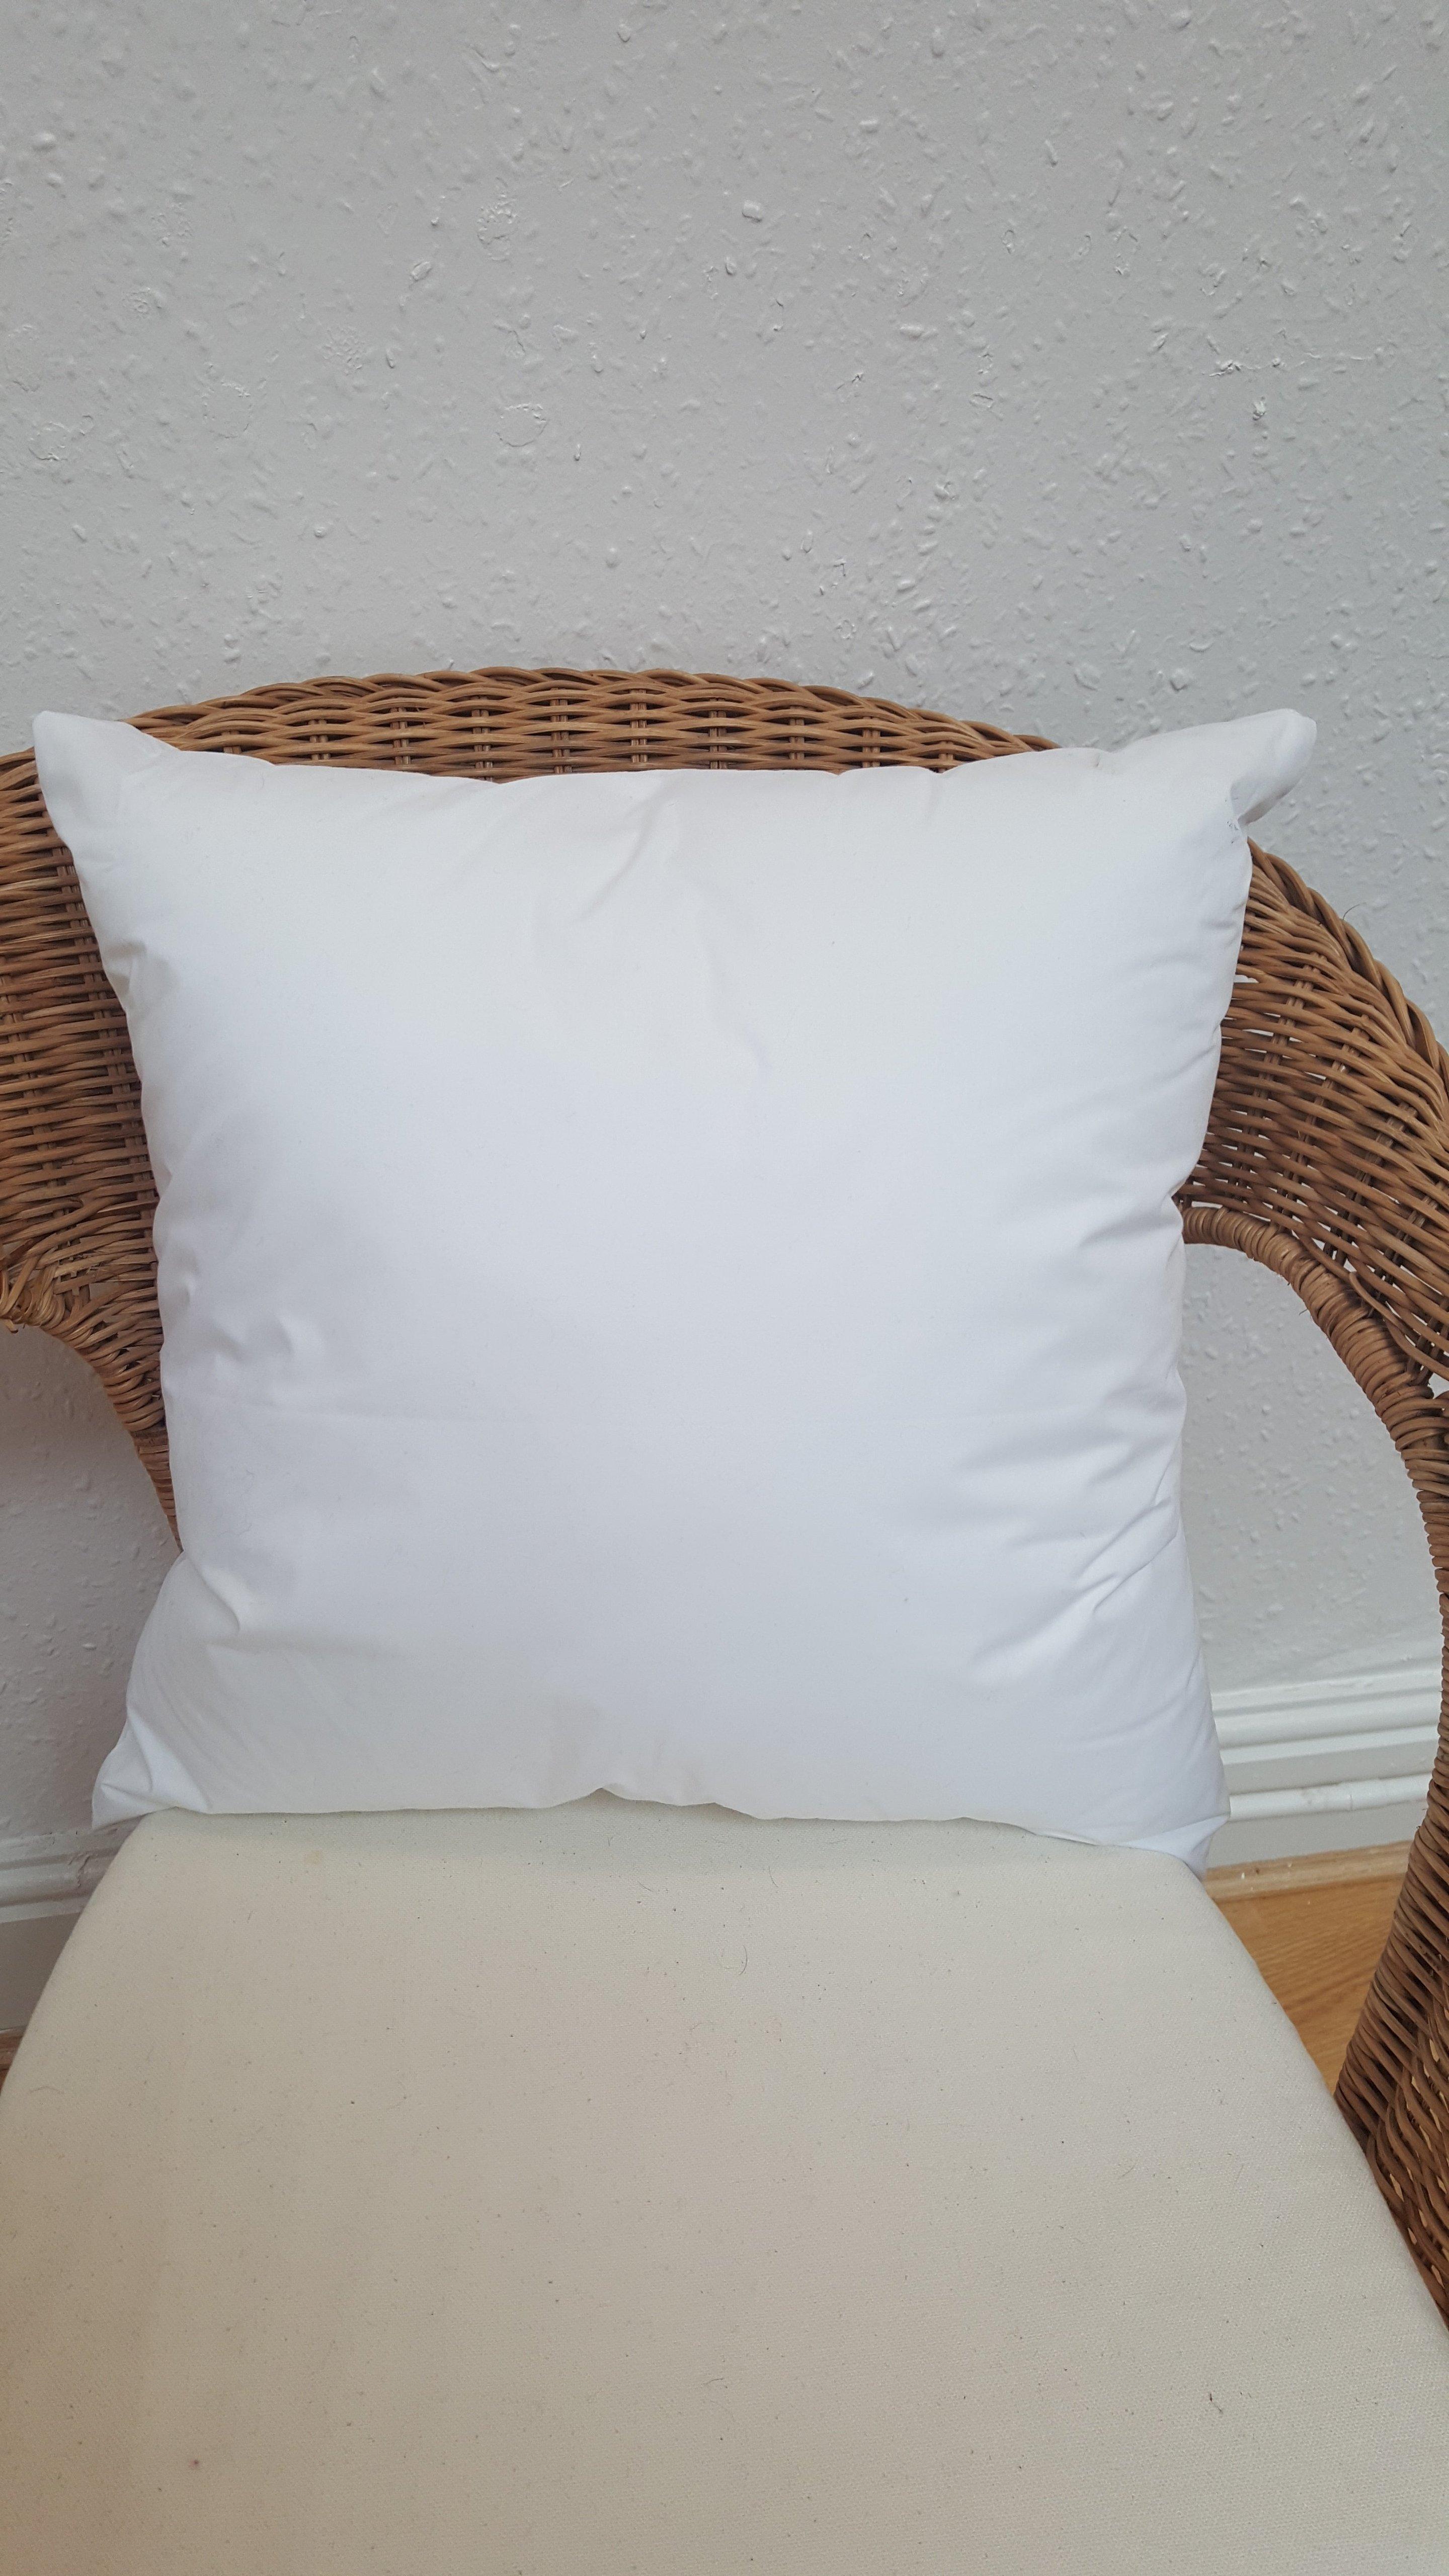 Plump cushion pad inners